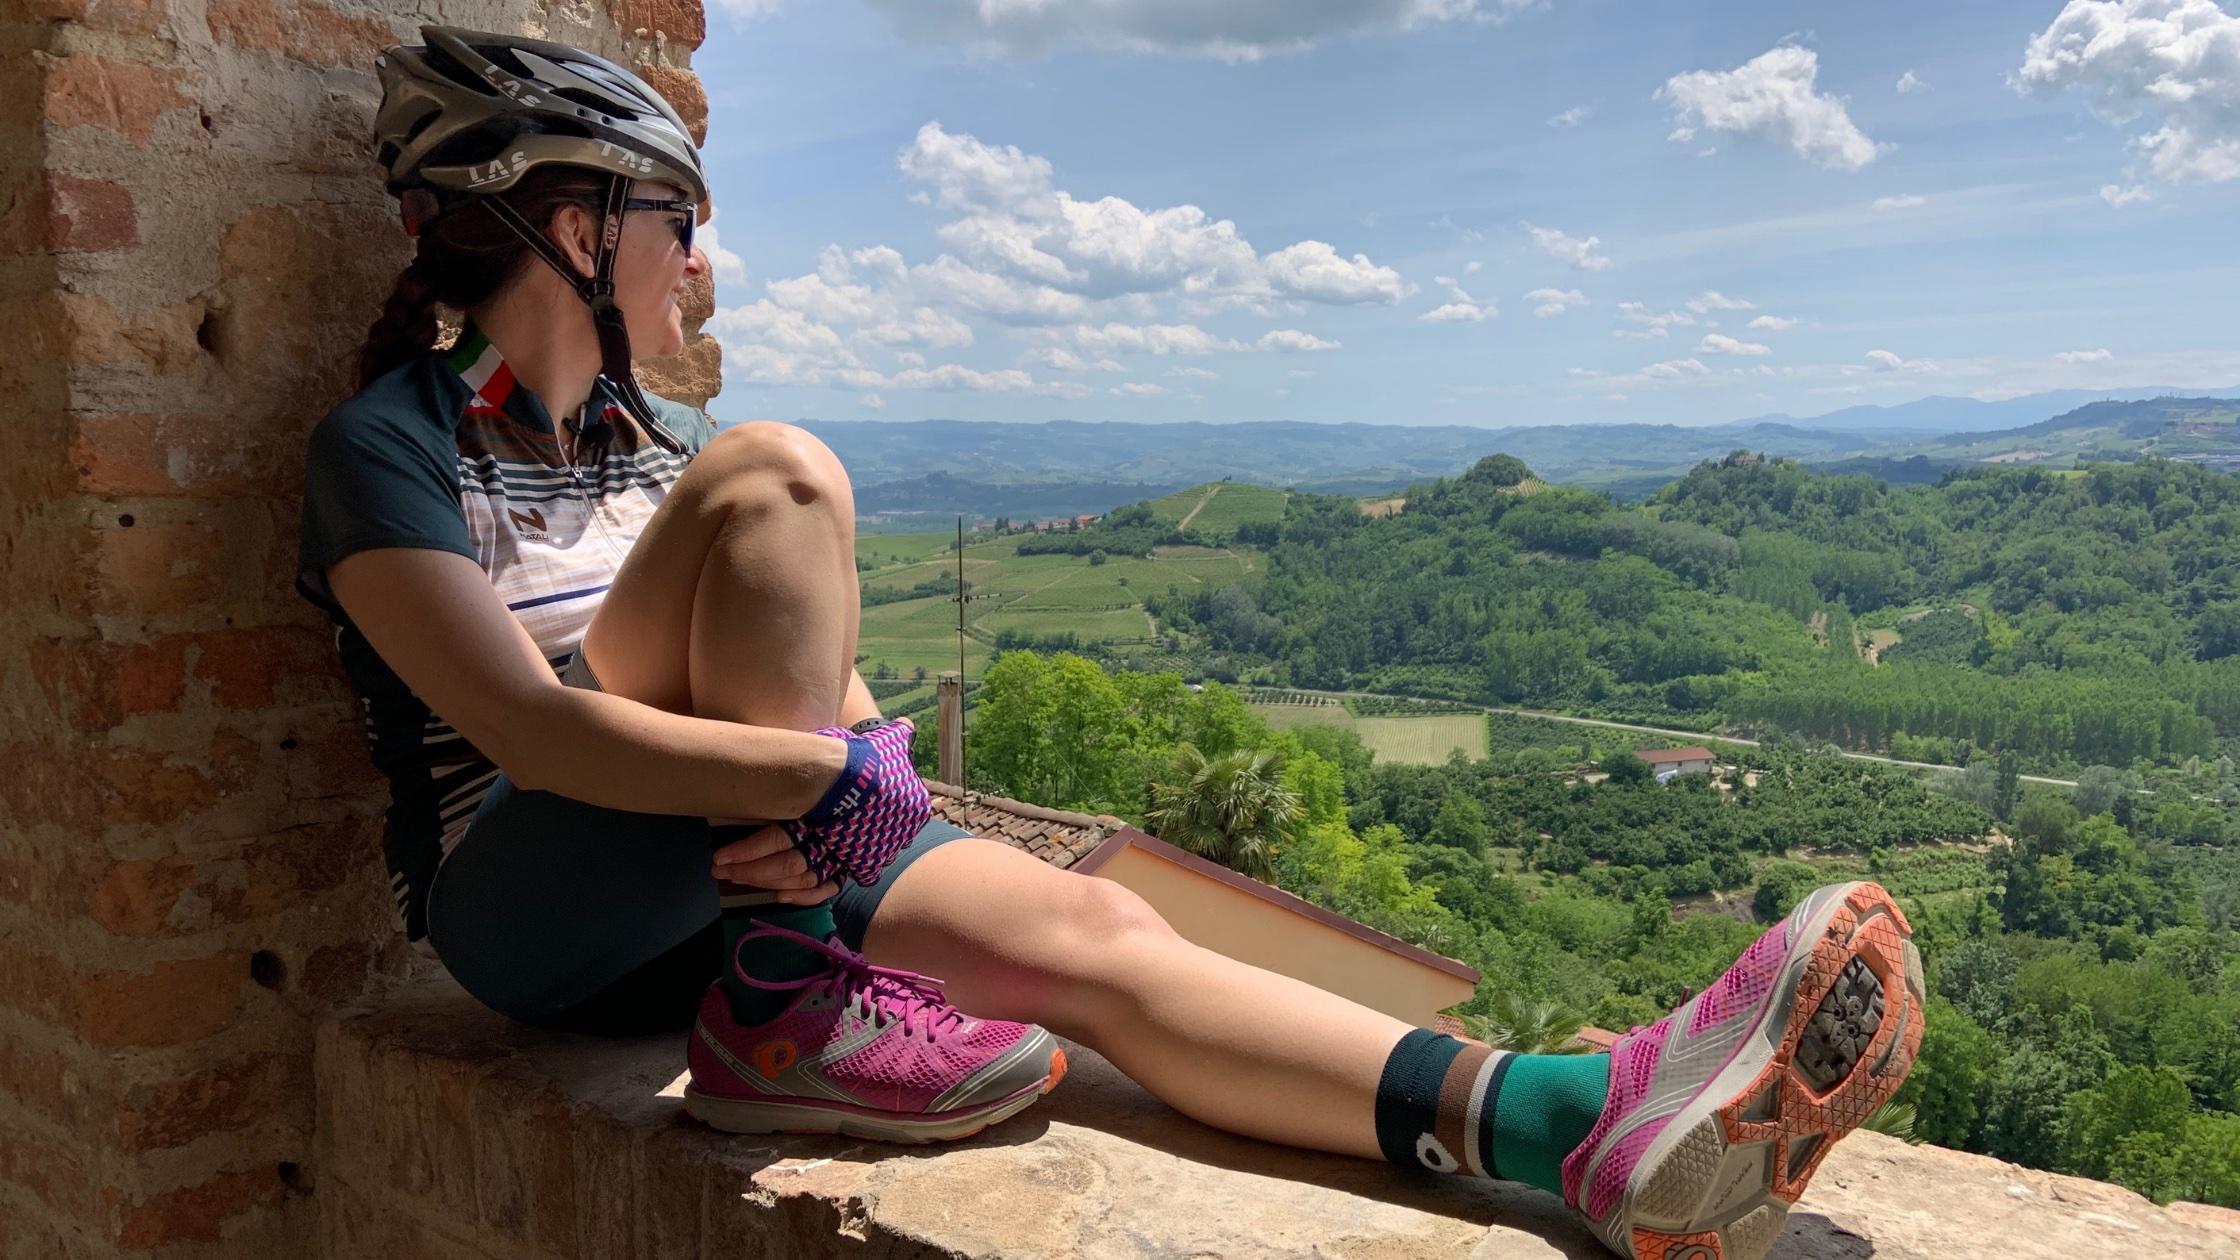 Off-Season Travel in Italy